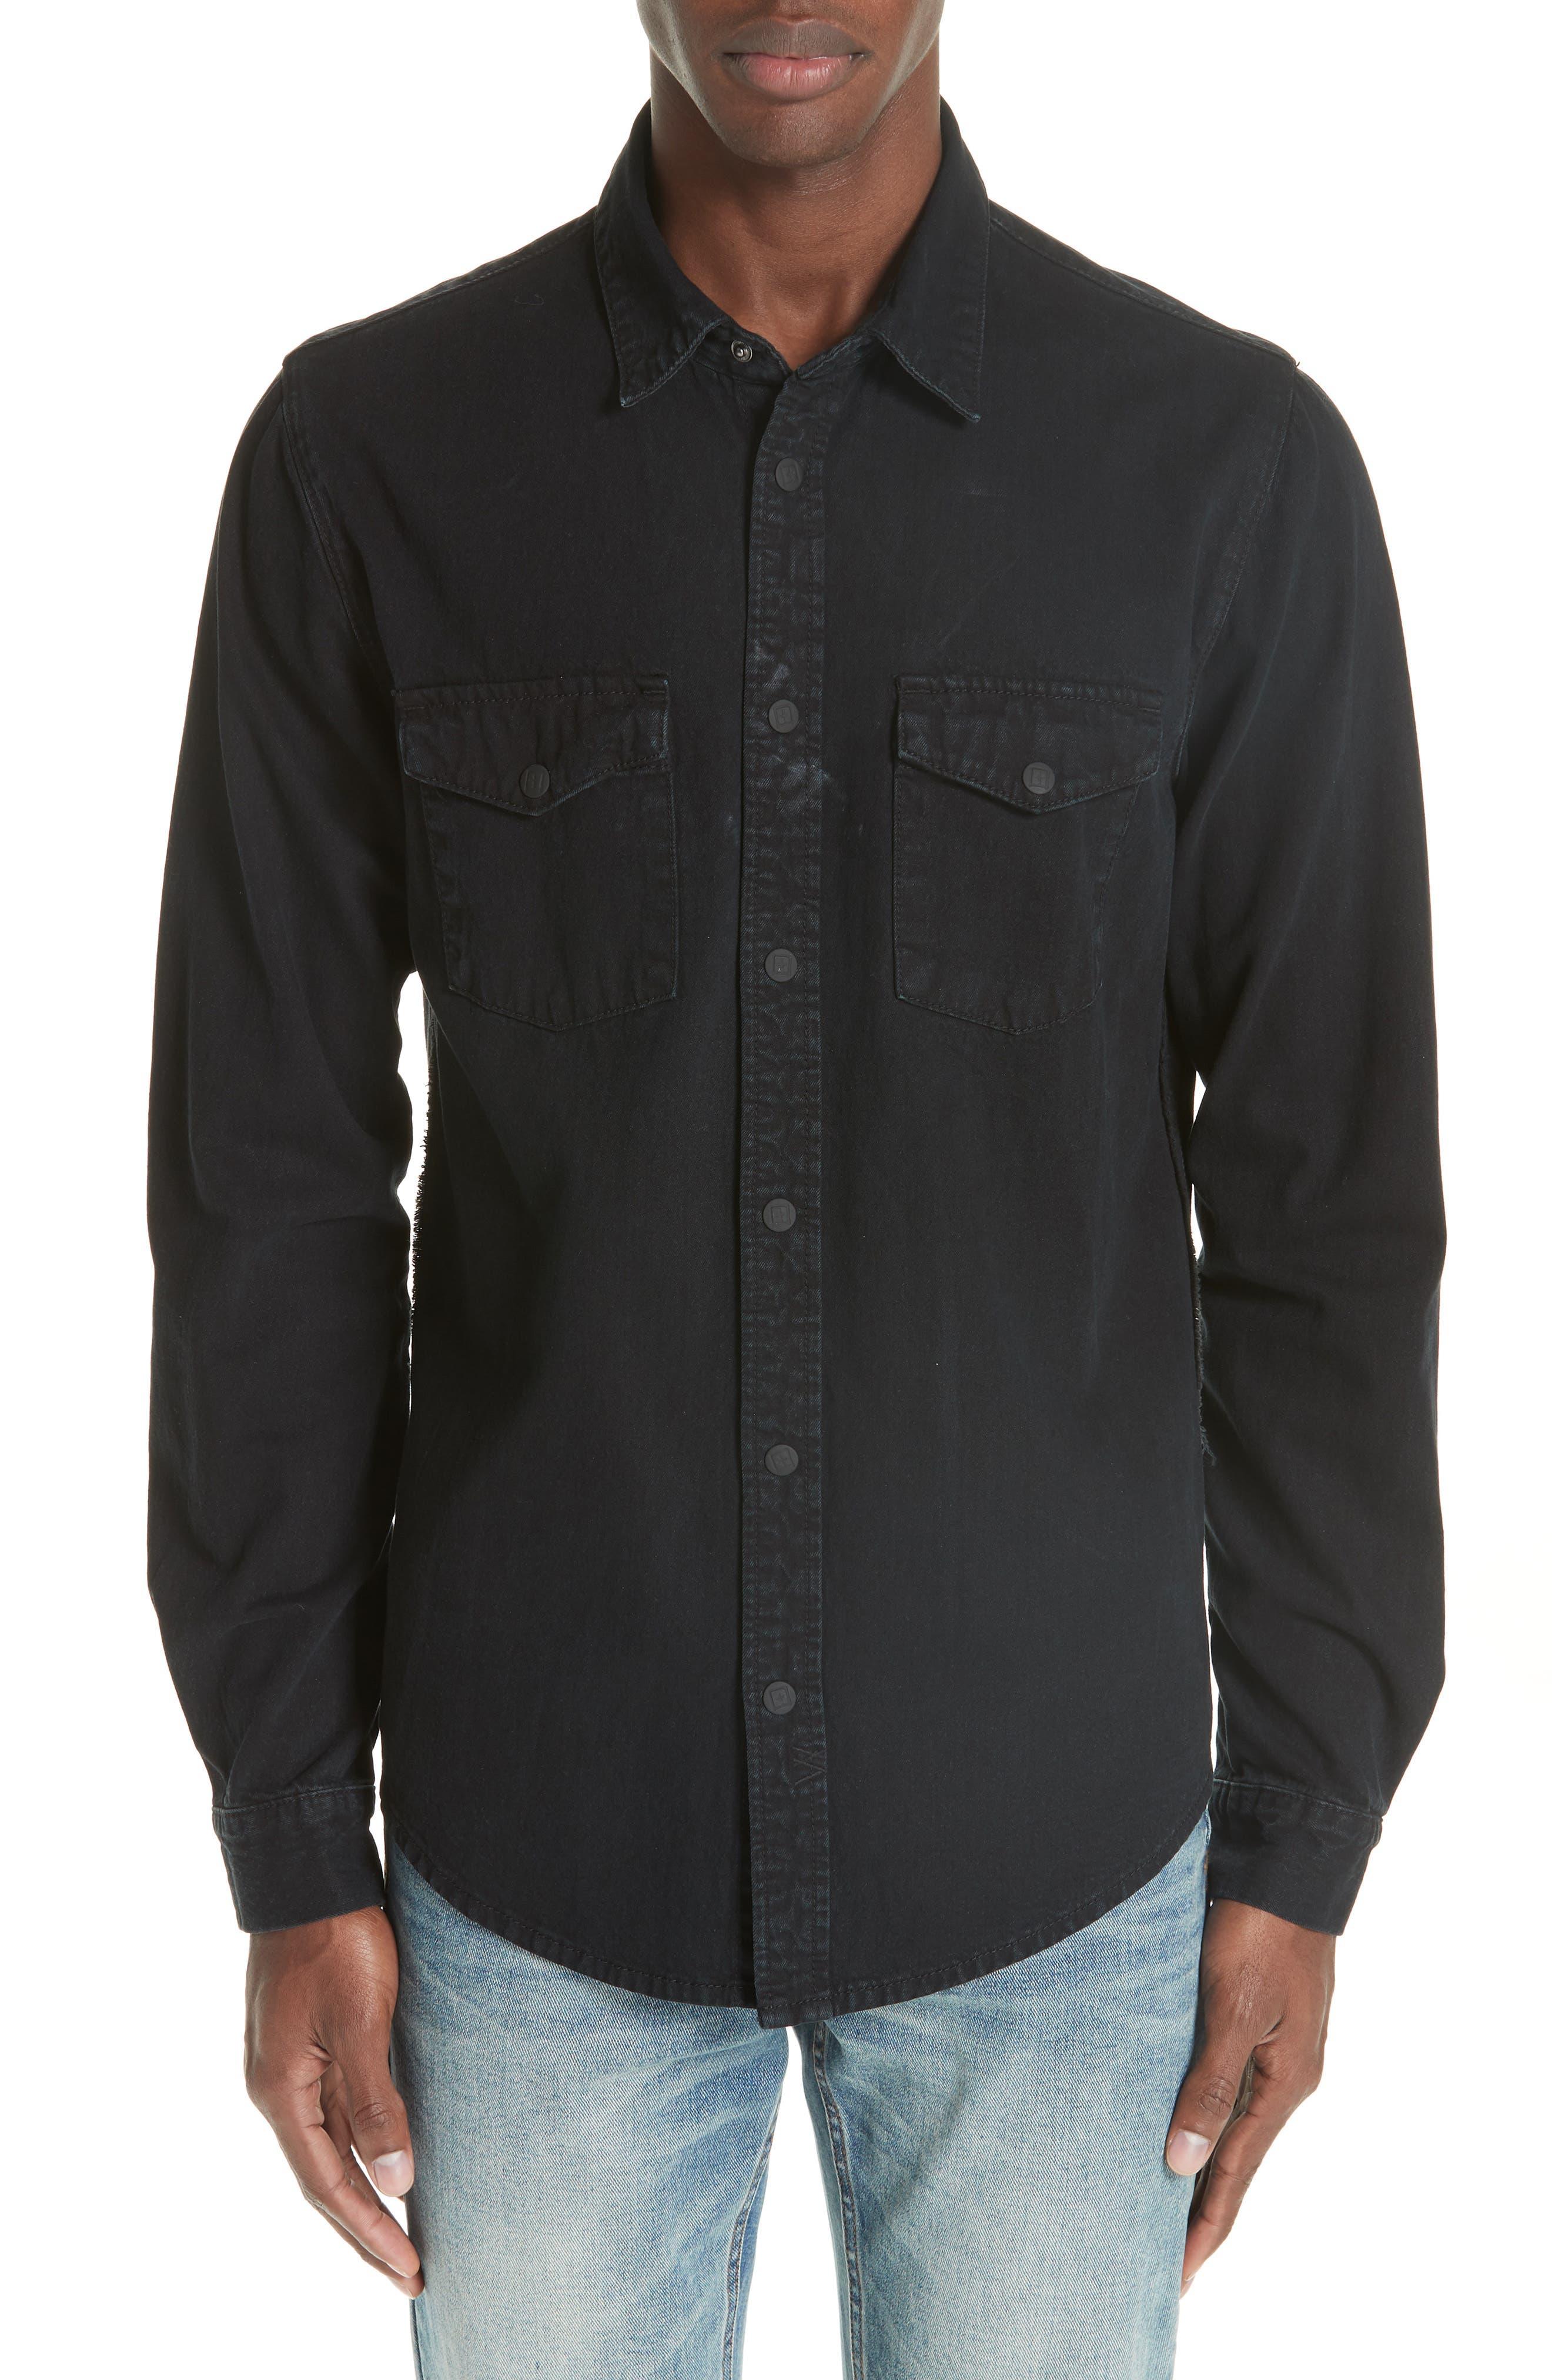 Frontier Work Shirt,                         Main,                         color, BLACK